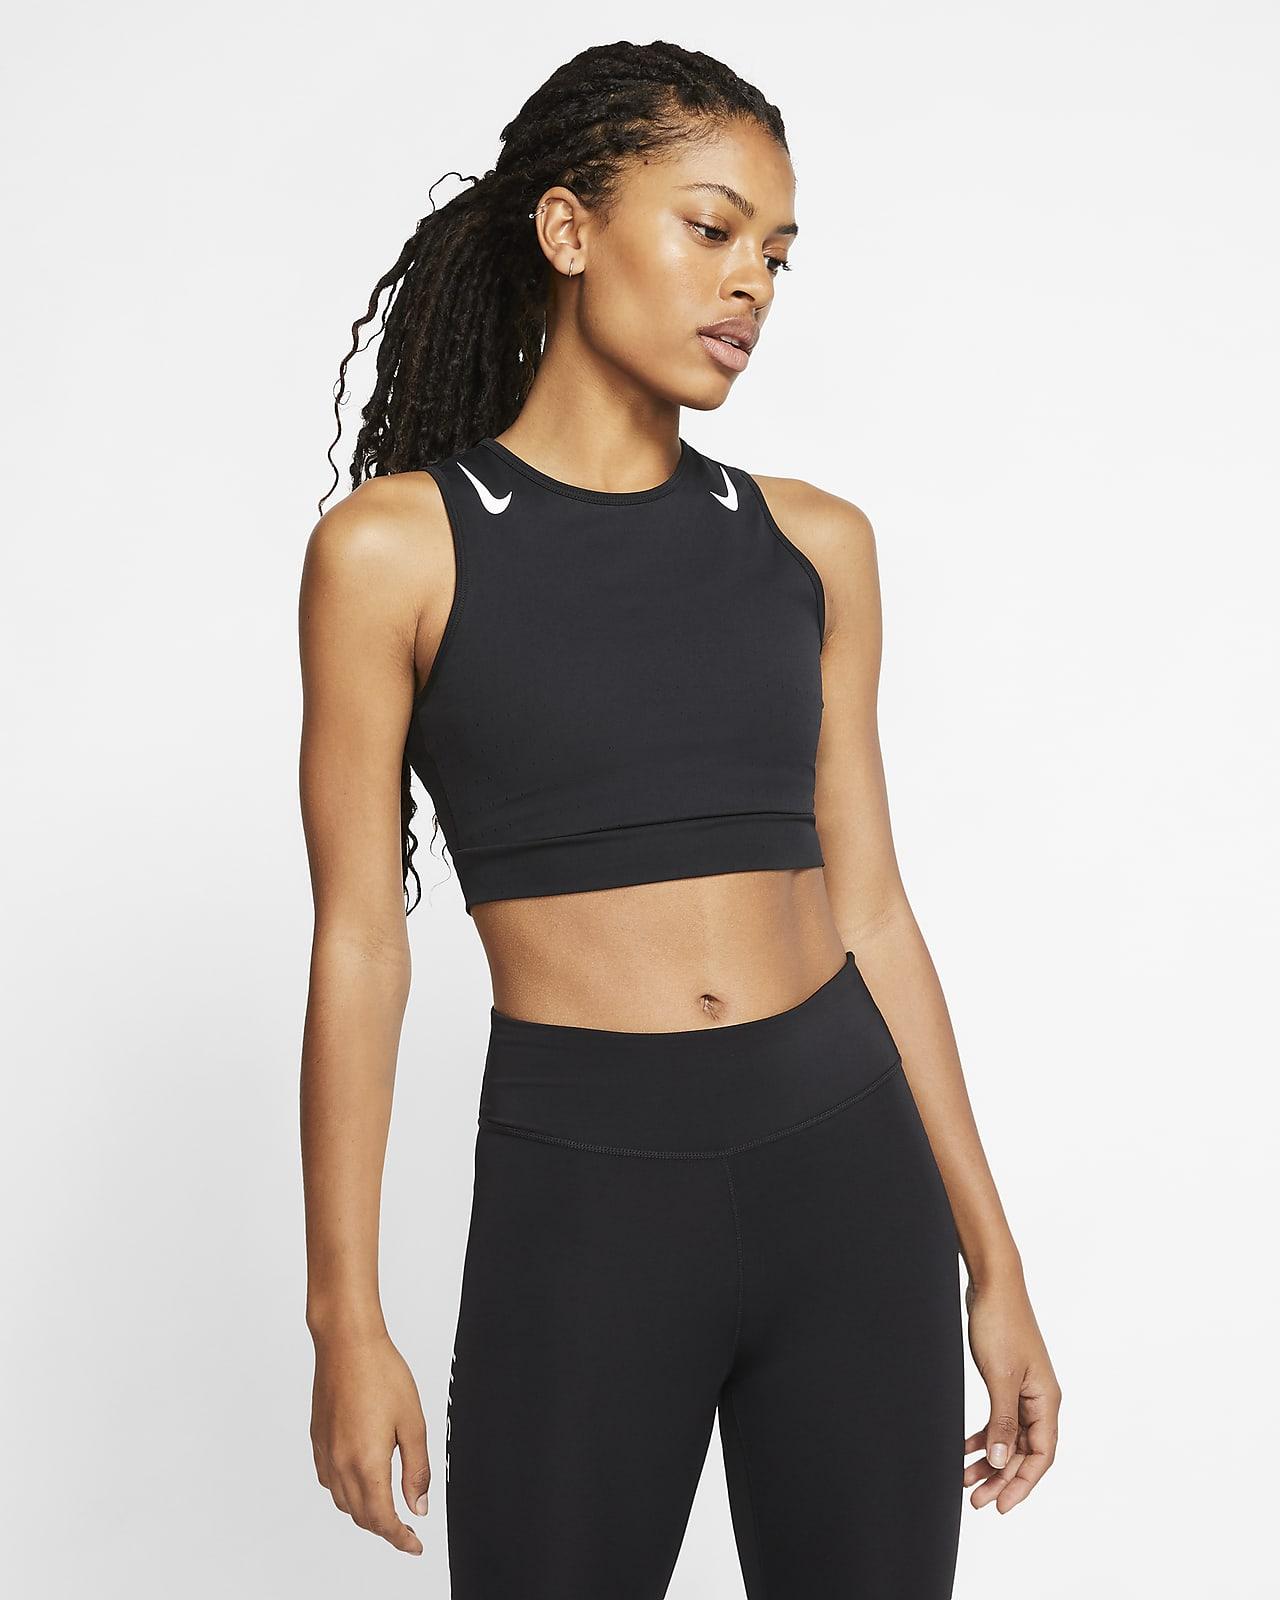 Nike AeroSwift Women's Running Crop Top